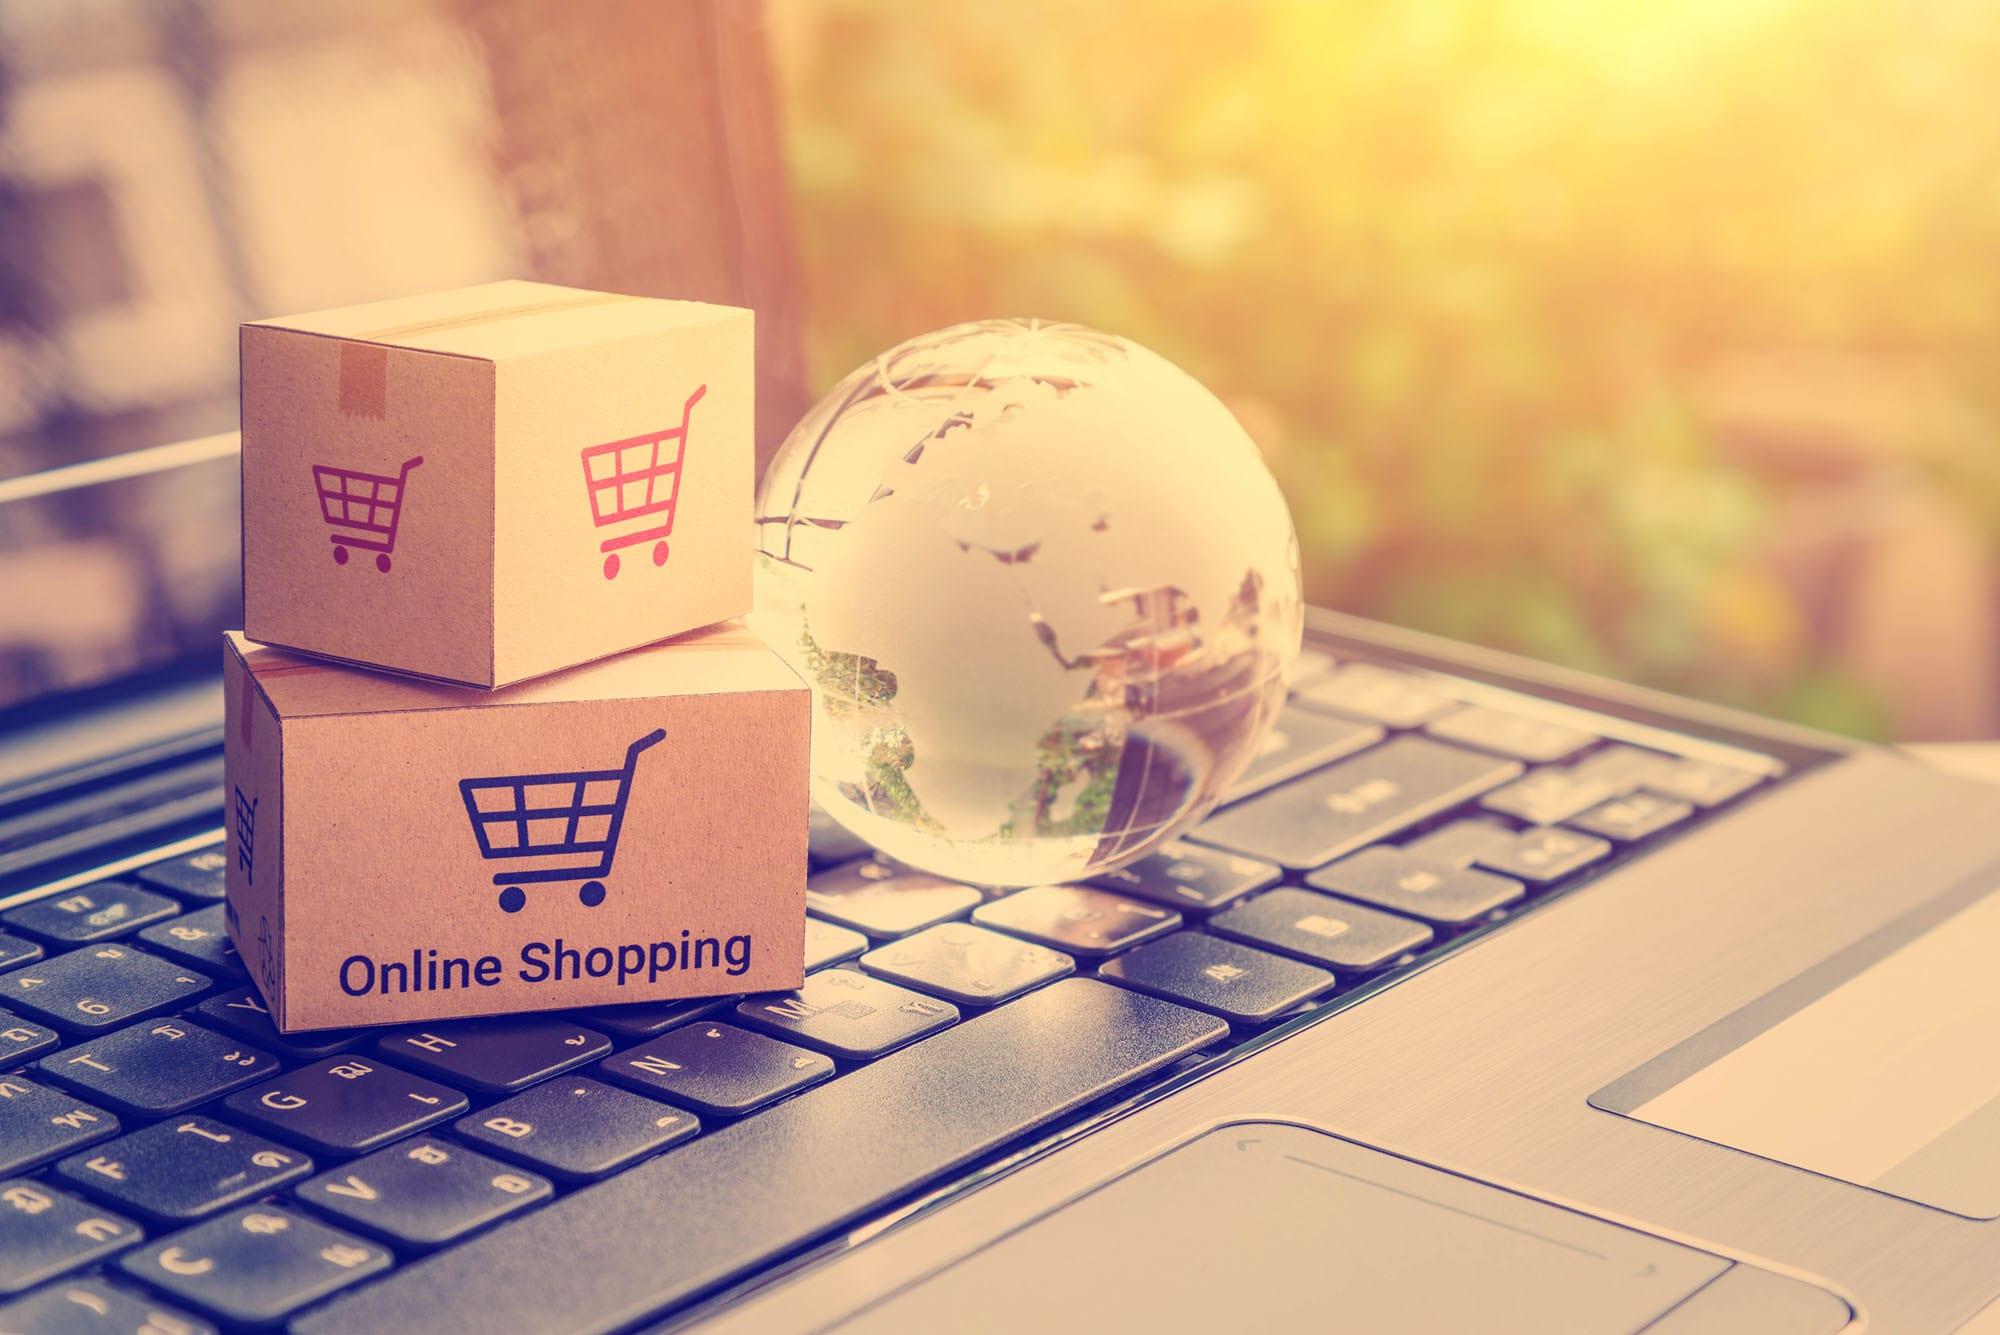 Marketing, Digital & Technology